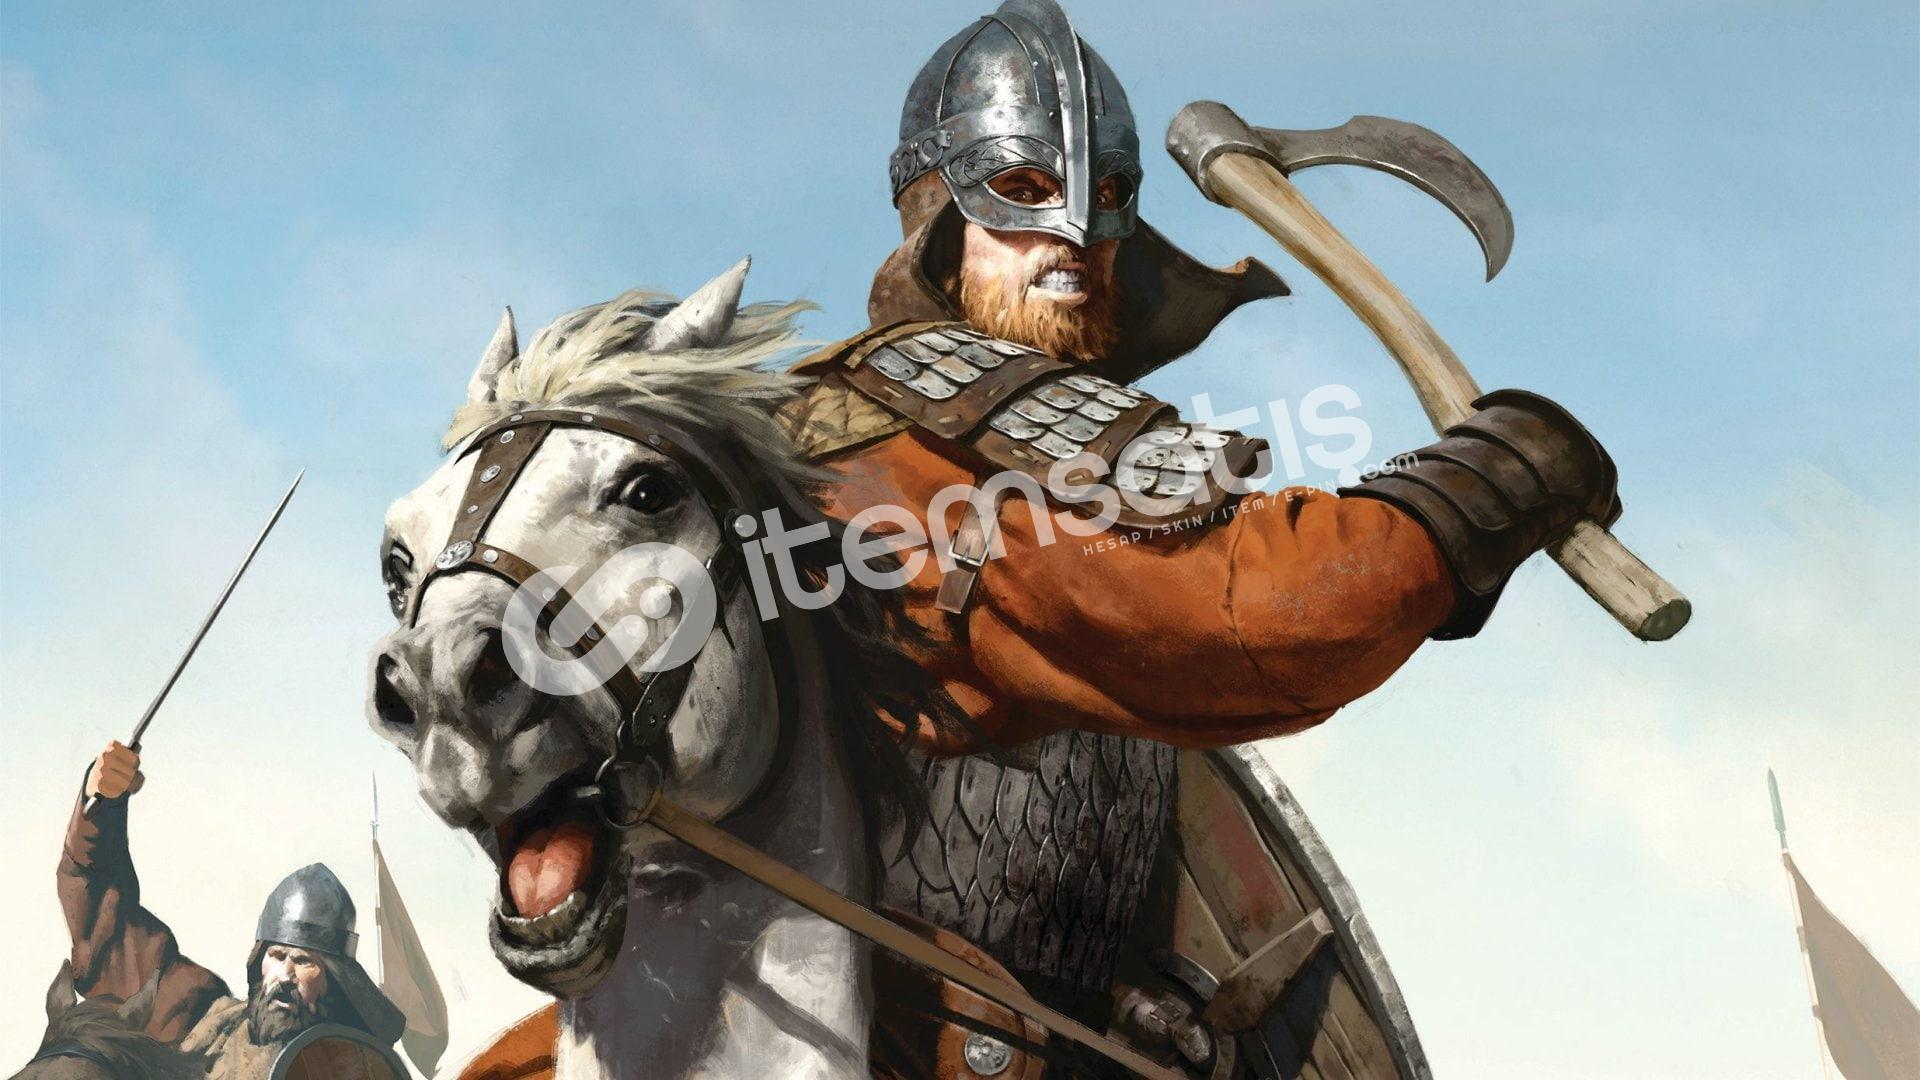 Mount & Blade II: Bannerlord + GARANTİ + GEFORCE NOW DESTEK